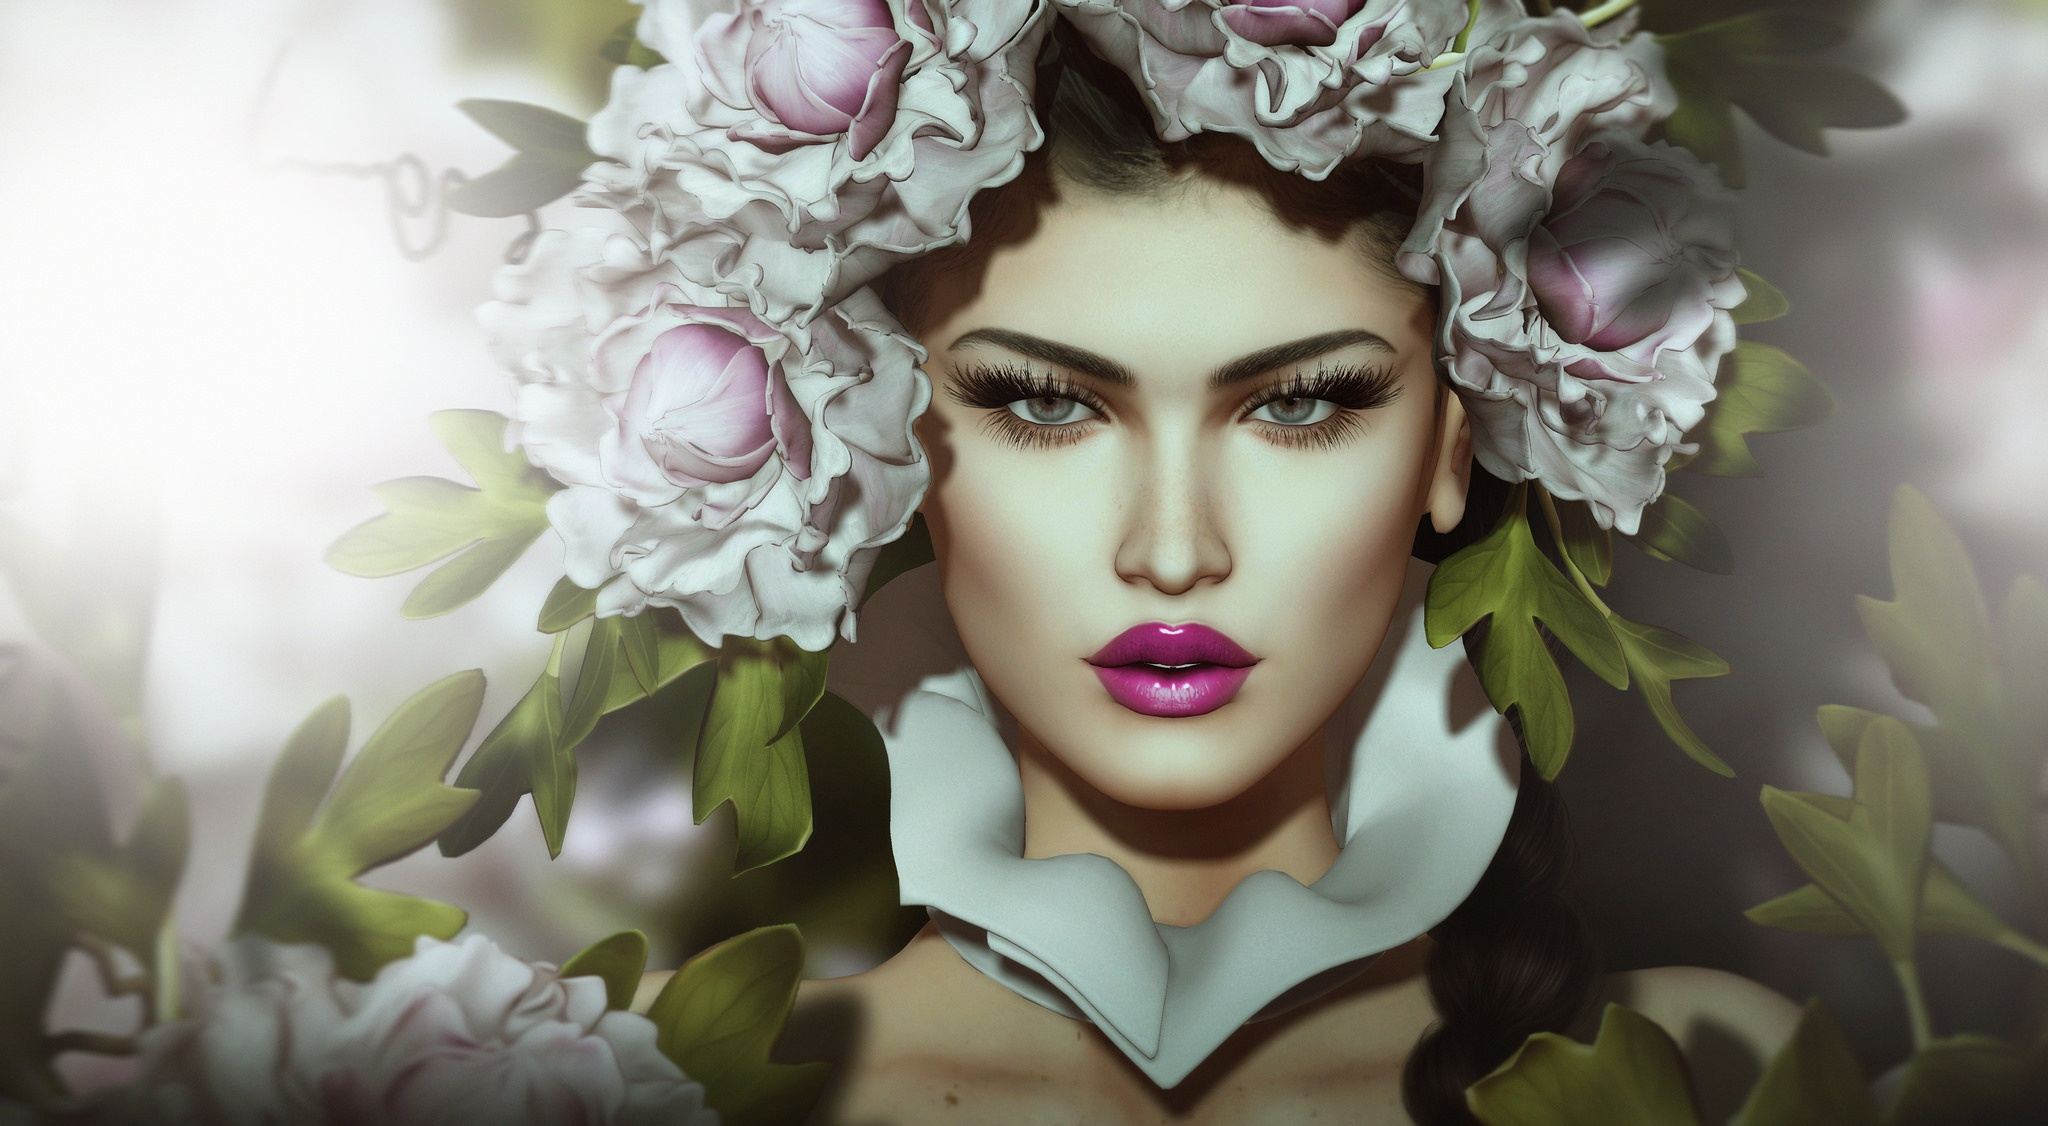 Лицо девушки из цветов фото